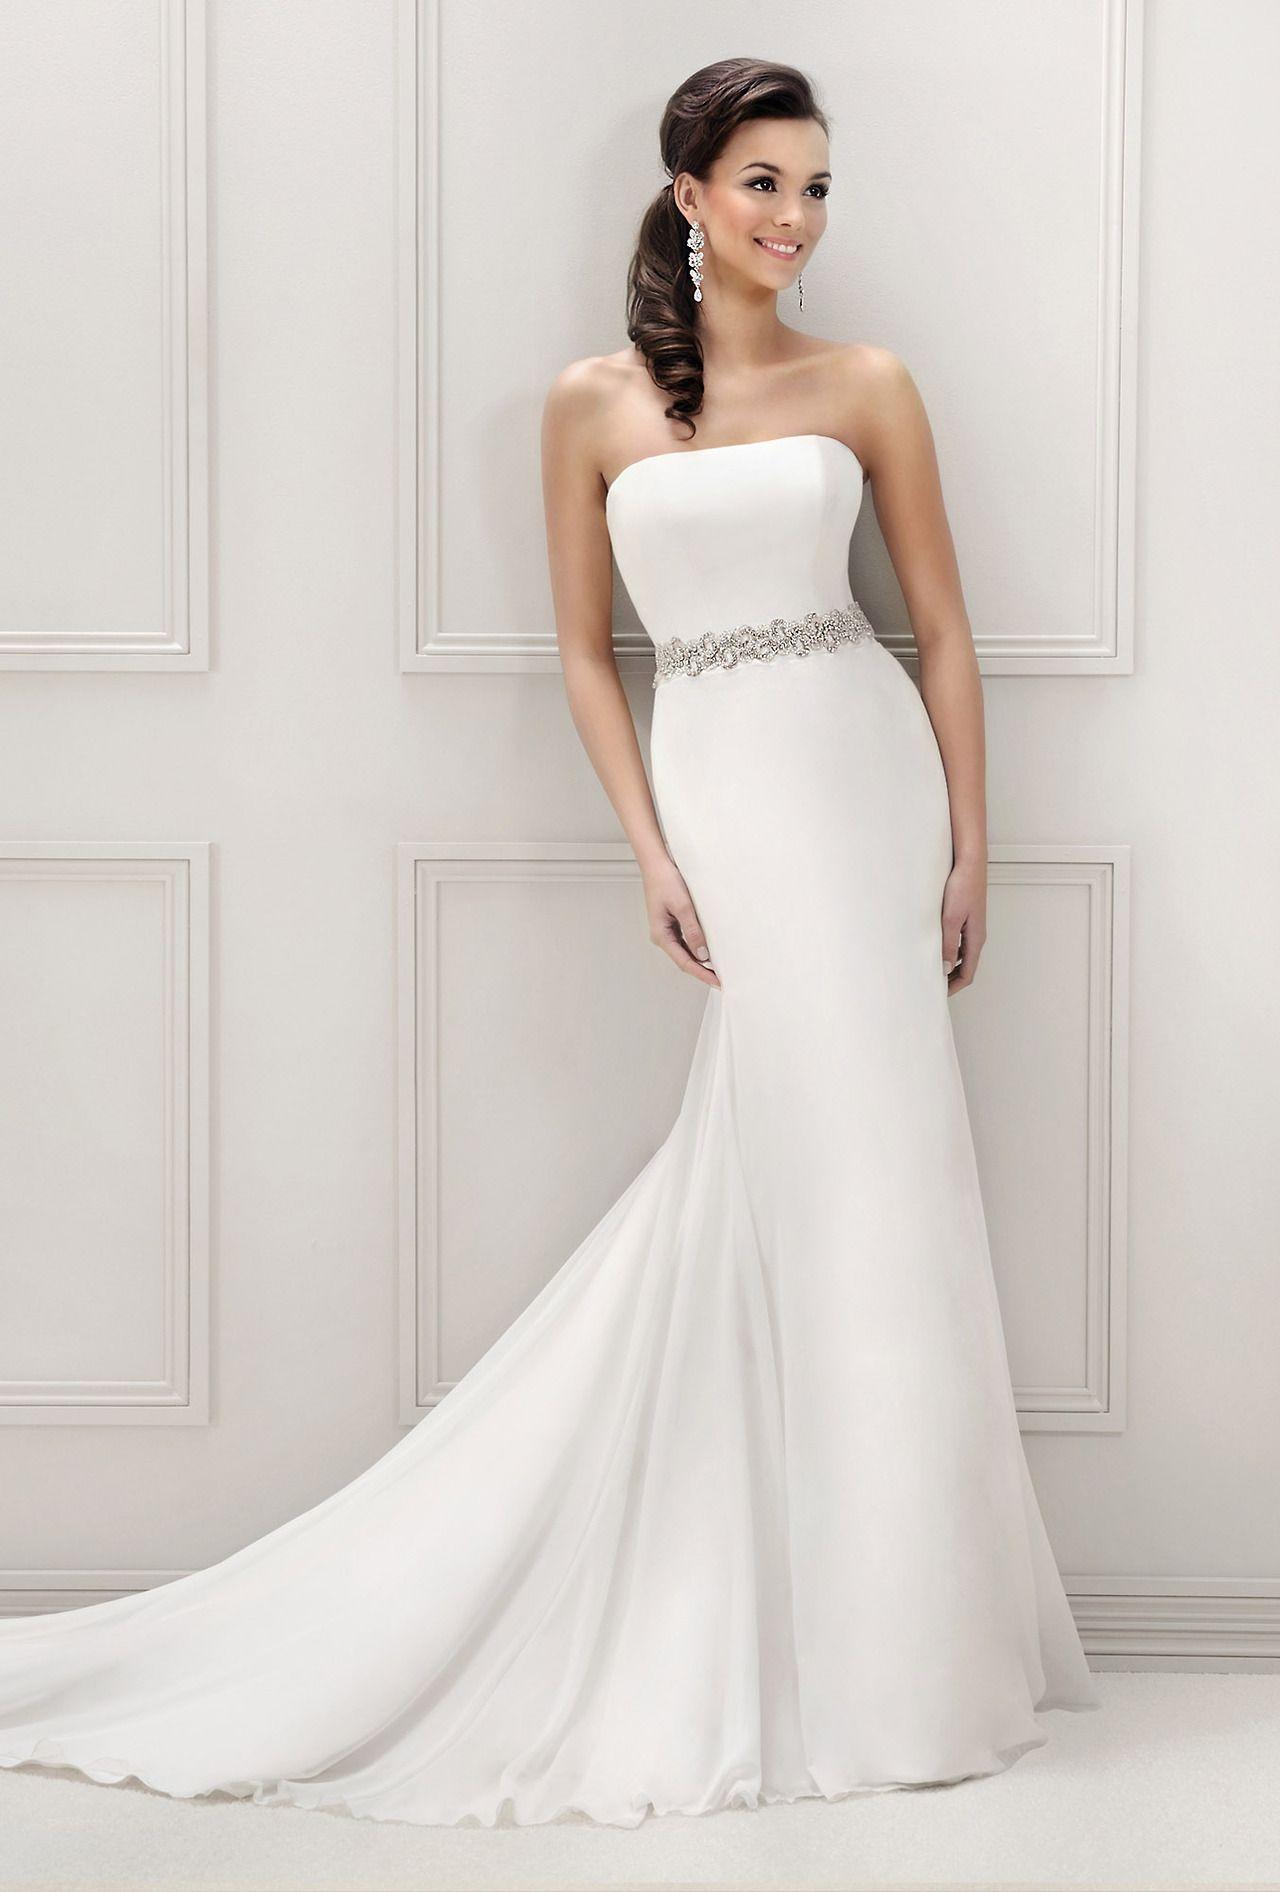 Agnes Bridal Dream Inexpensive Wedding Dresses Wedding Dresses Wedding Dress Inspiration